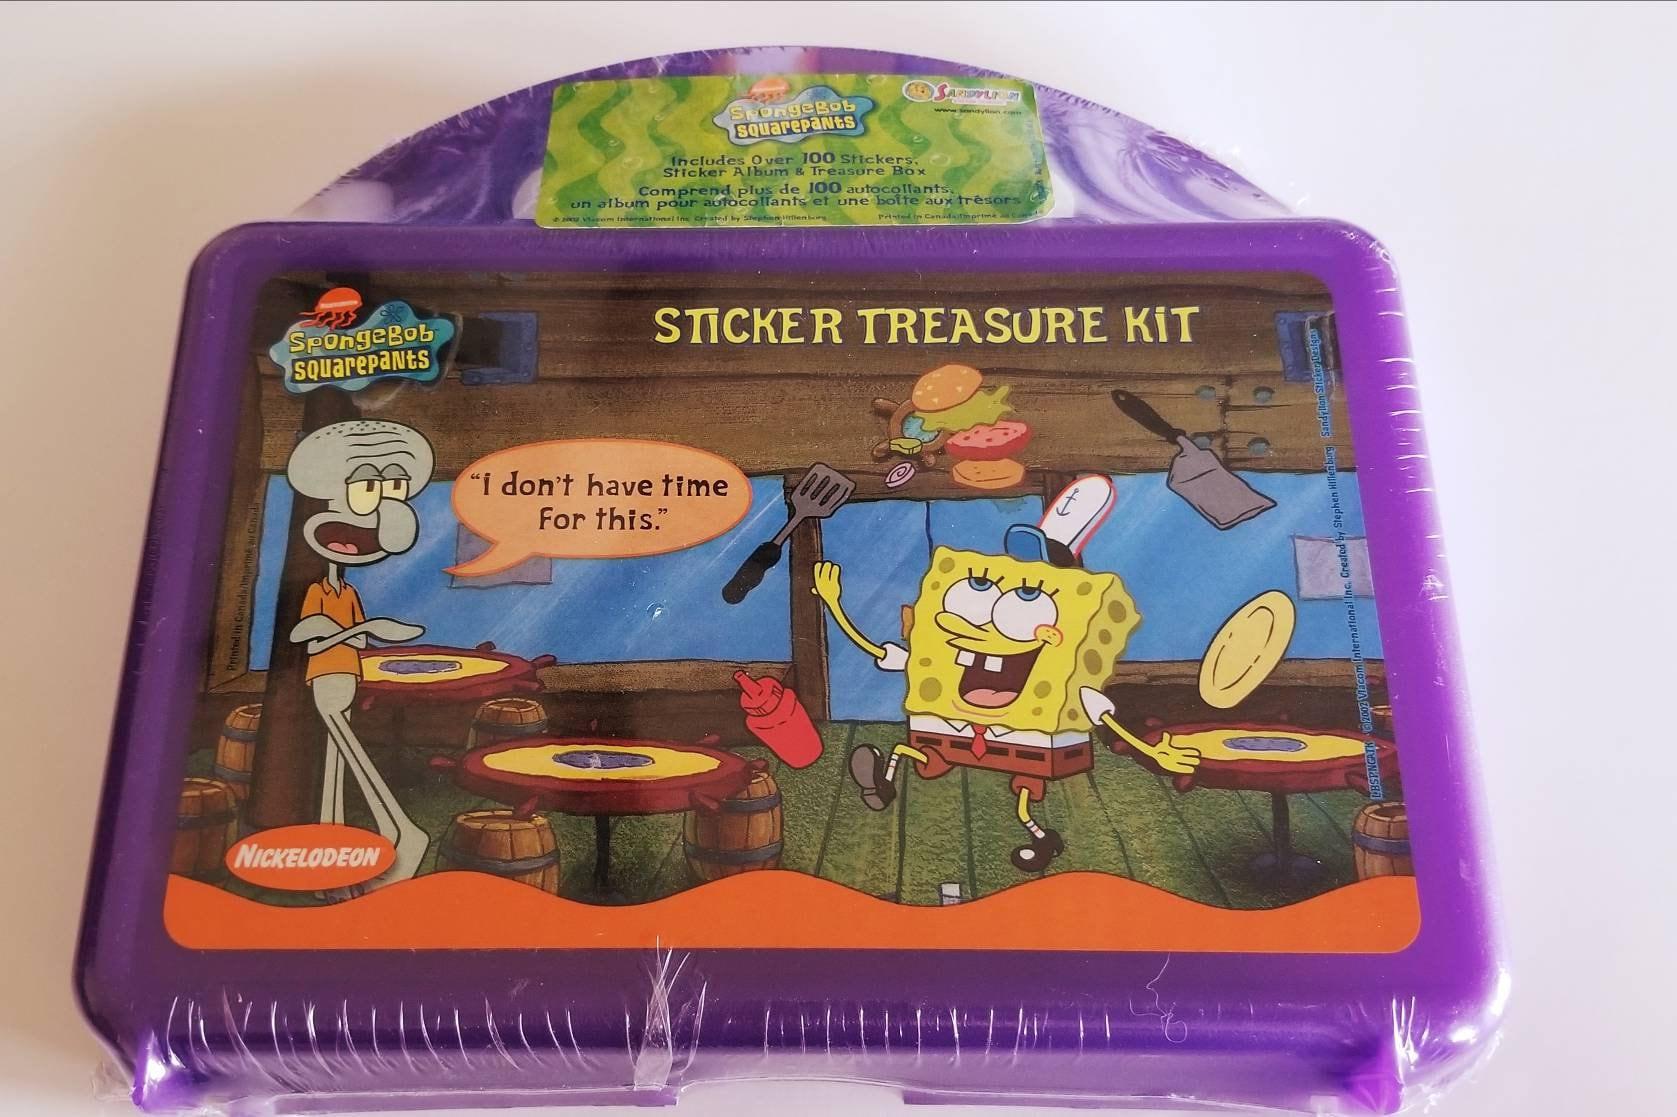 Vtg Sandylion SpongeBob Squarepants Sticker Treasure Kit SEALED Sticker  Album with Over 100 Stickers Squidward Patrick Star Nickelodeon